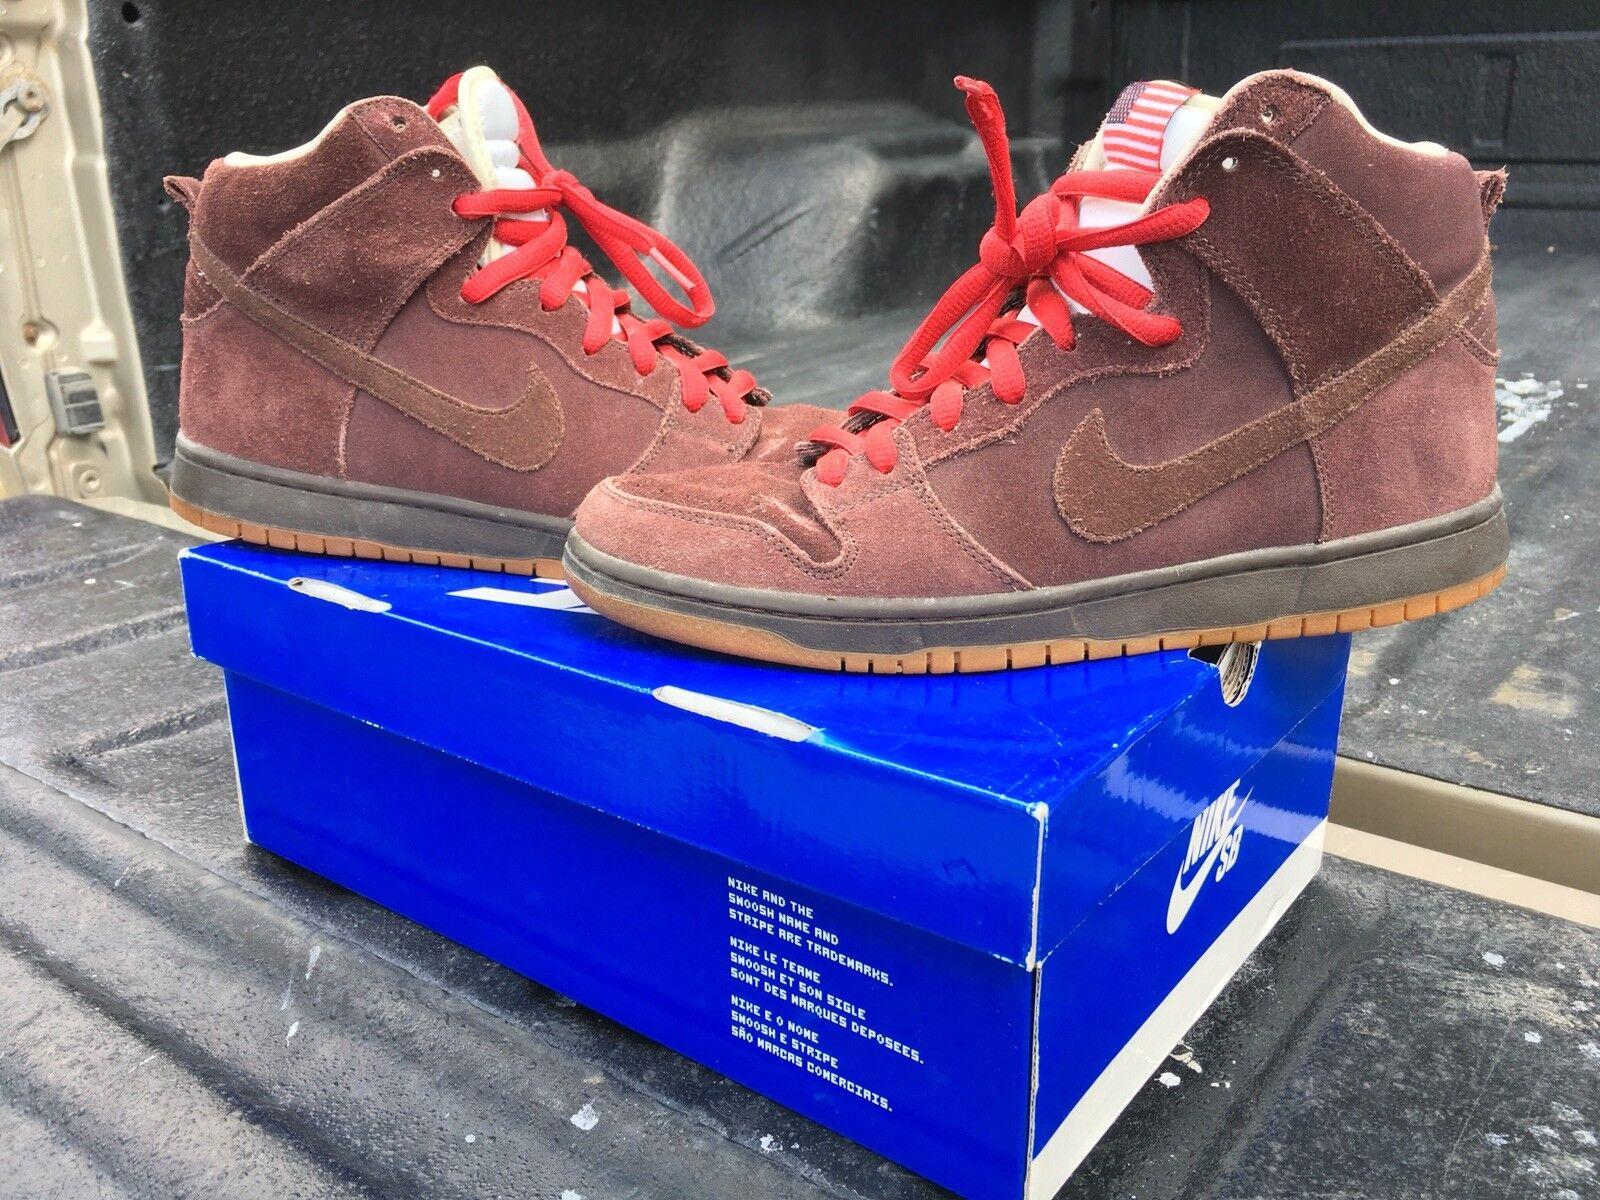 Nike Sb Dunk High Budweiser Size 9.5